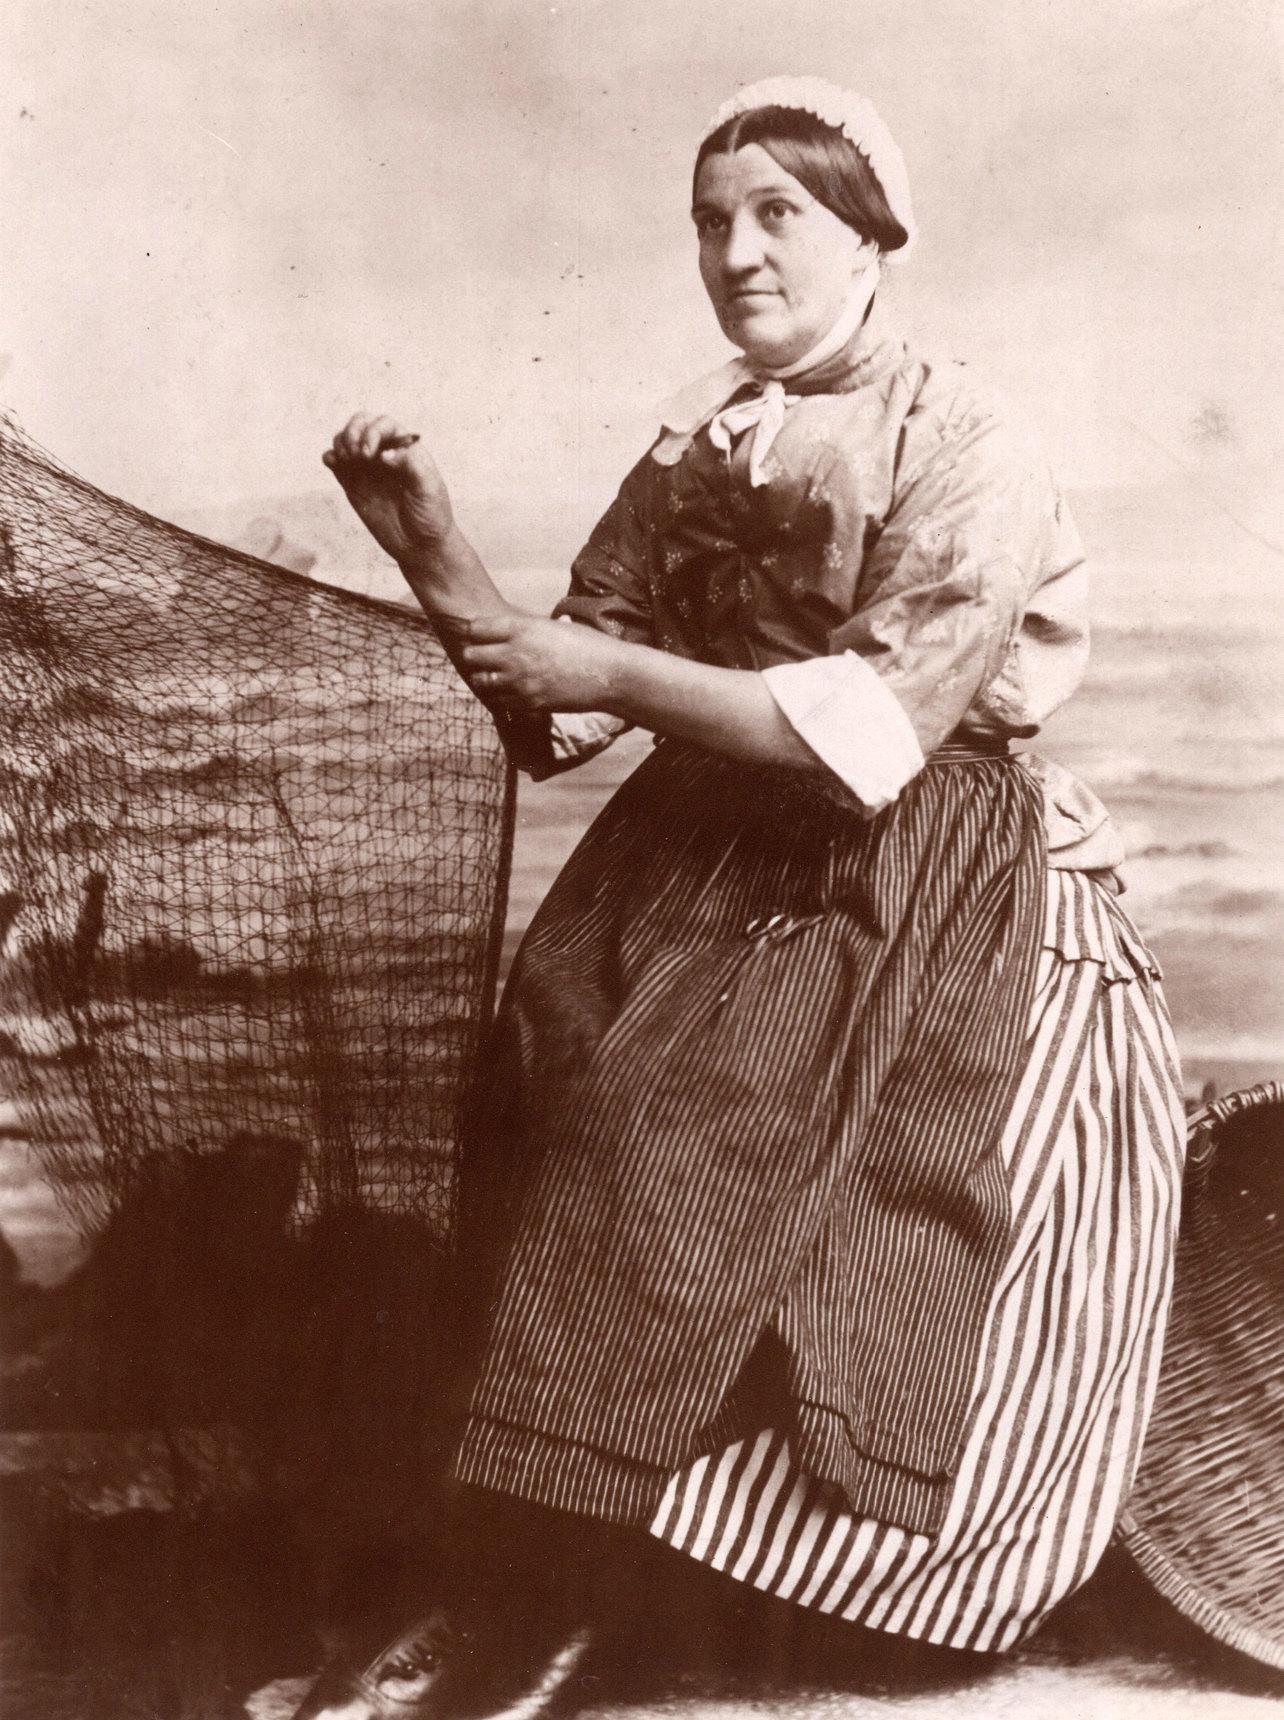 Studio Portrait Newhaven Fishwife Mending Net c.1900